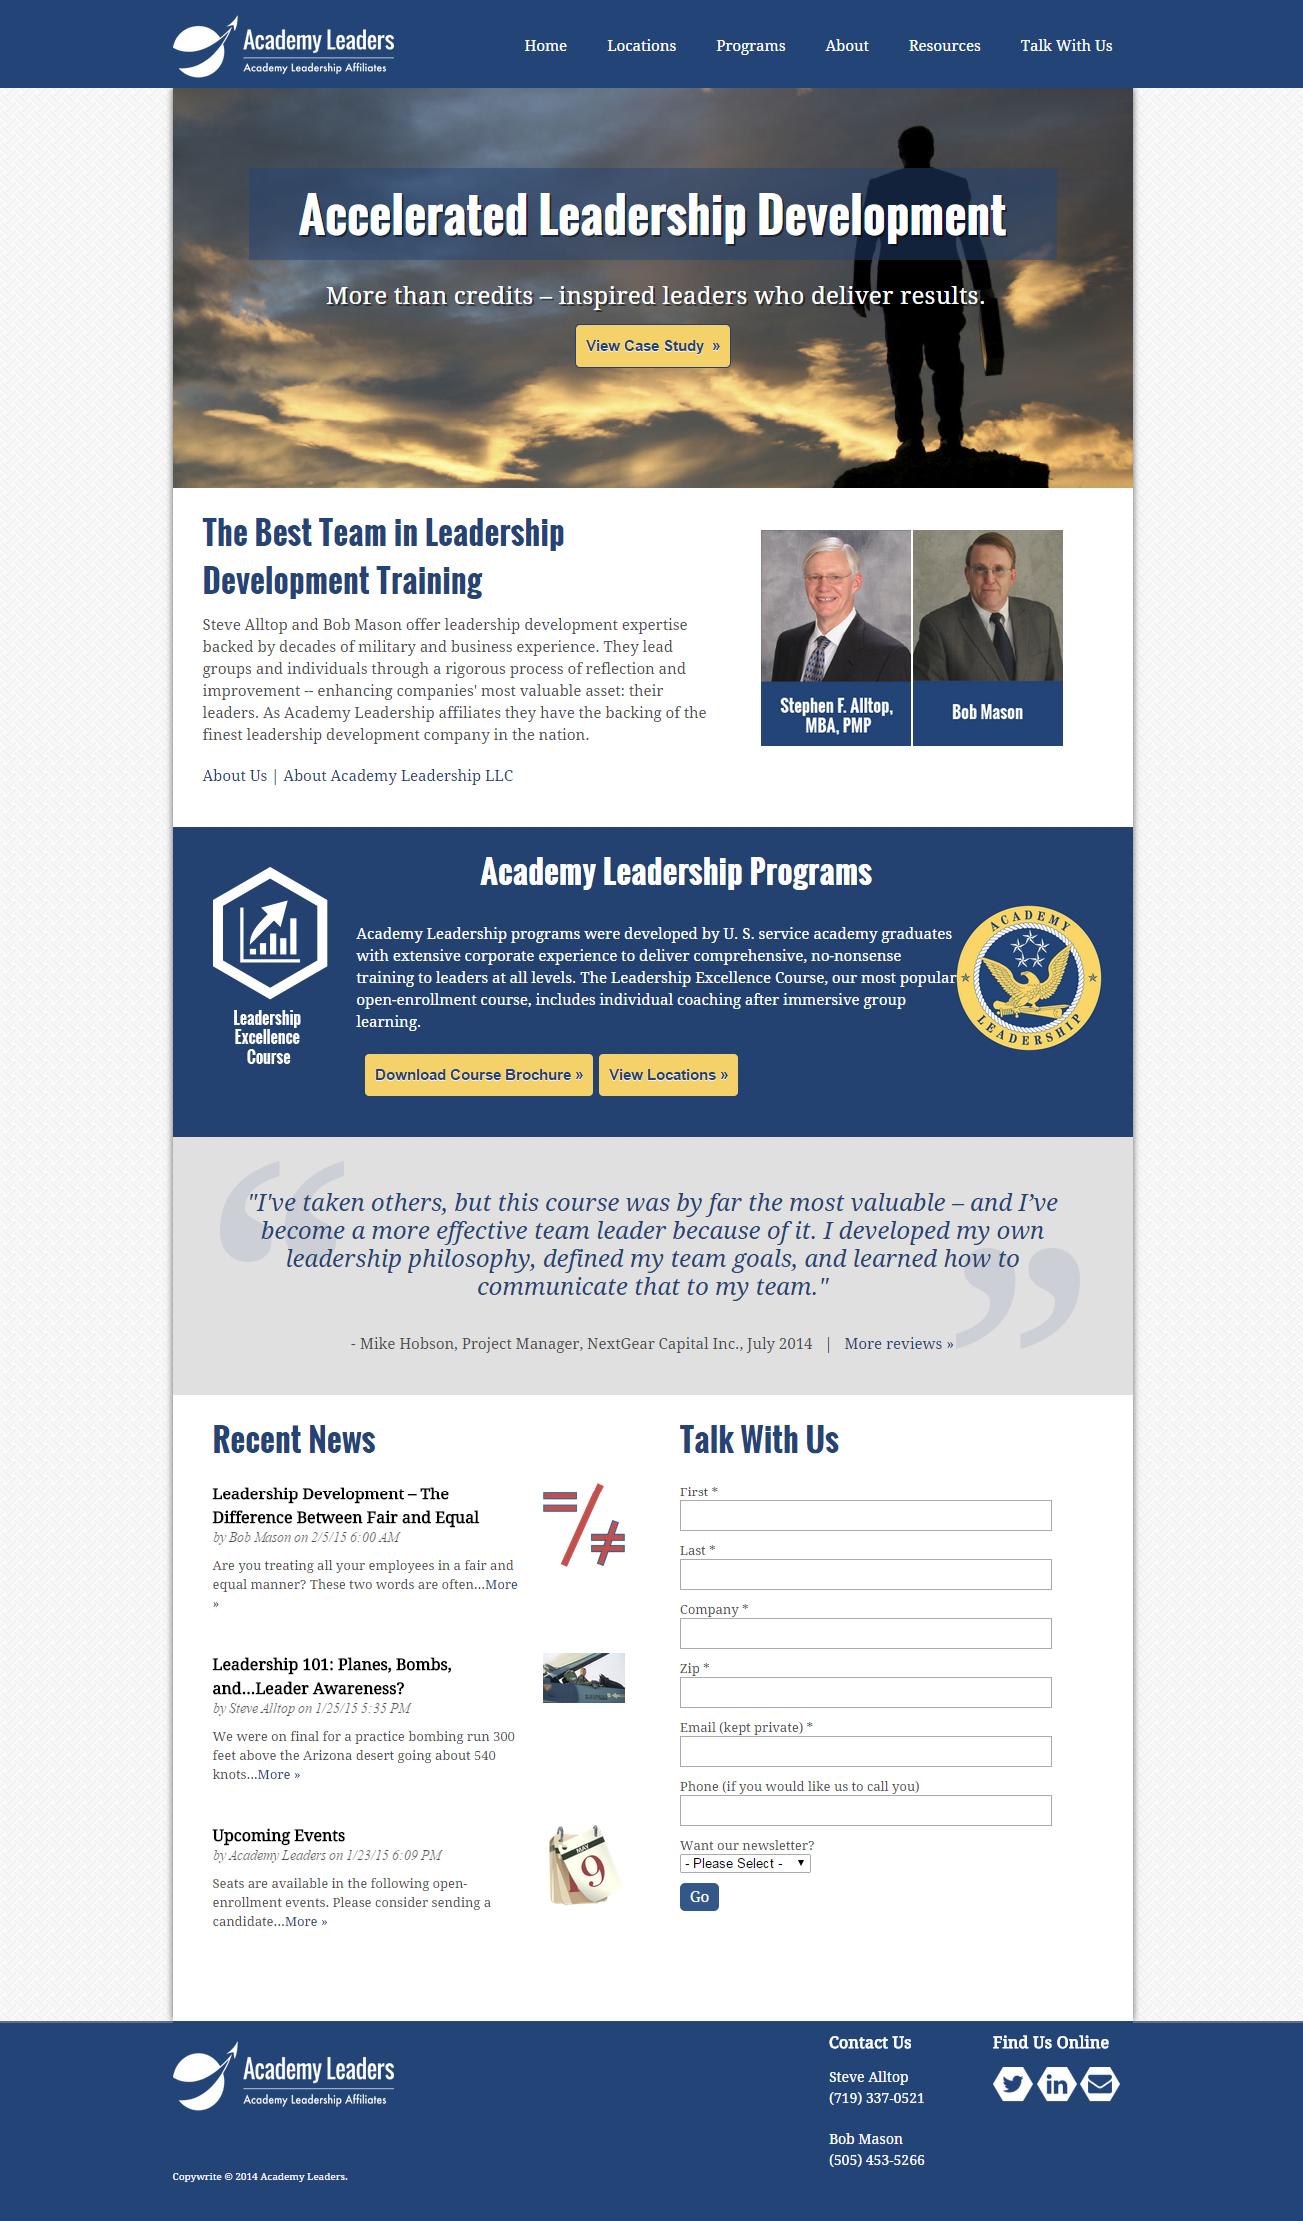 B2B built the client's website on the Hubspot COS